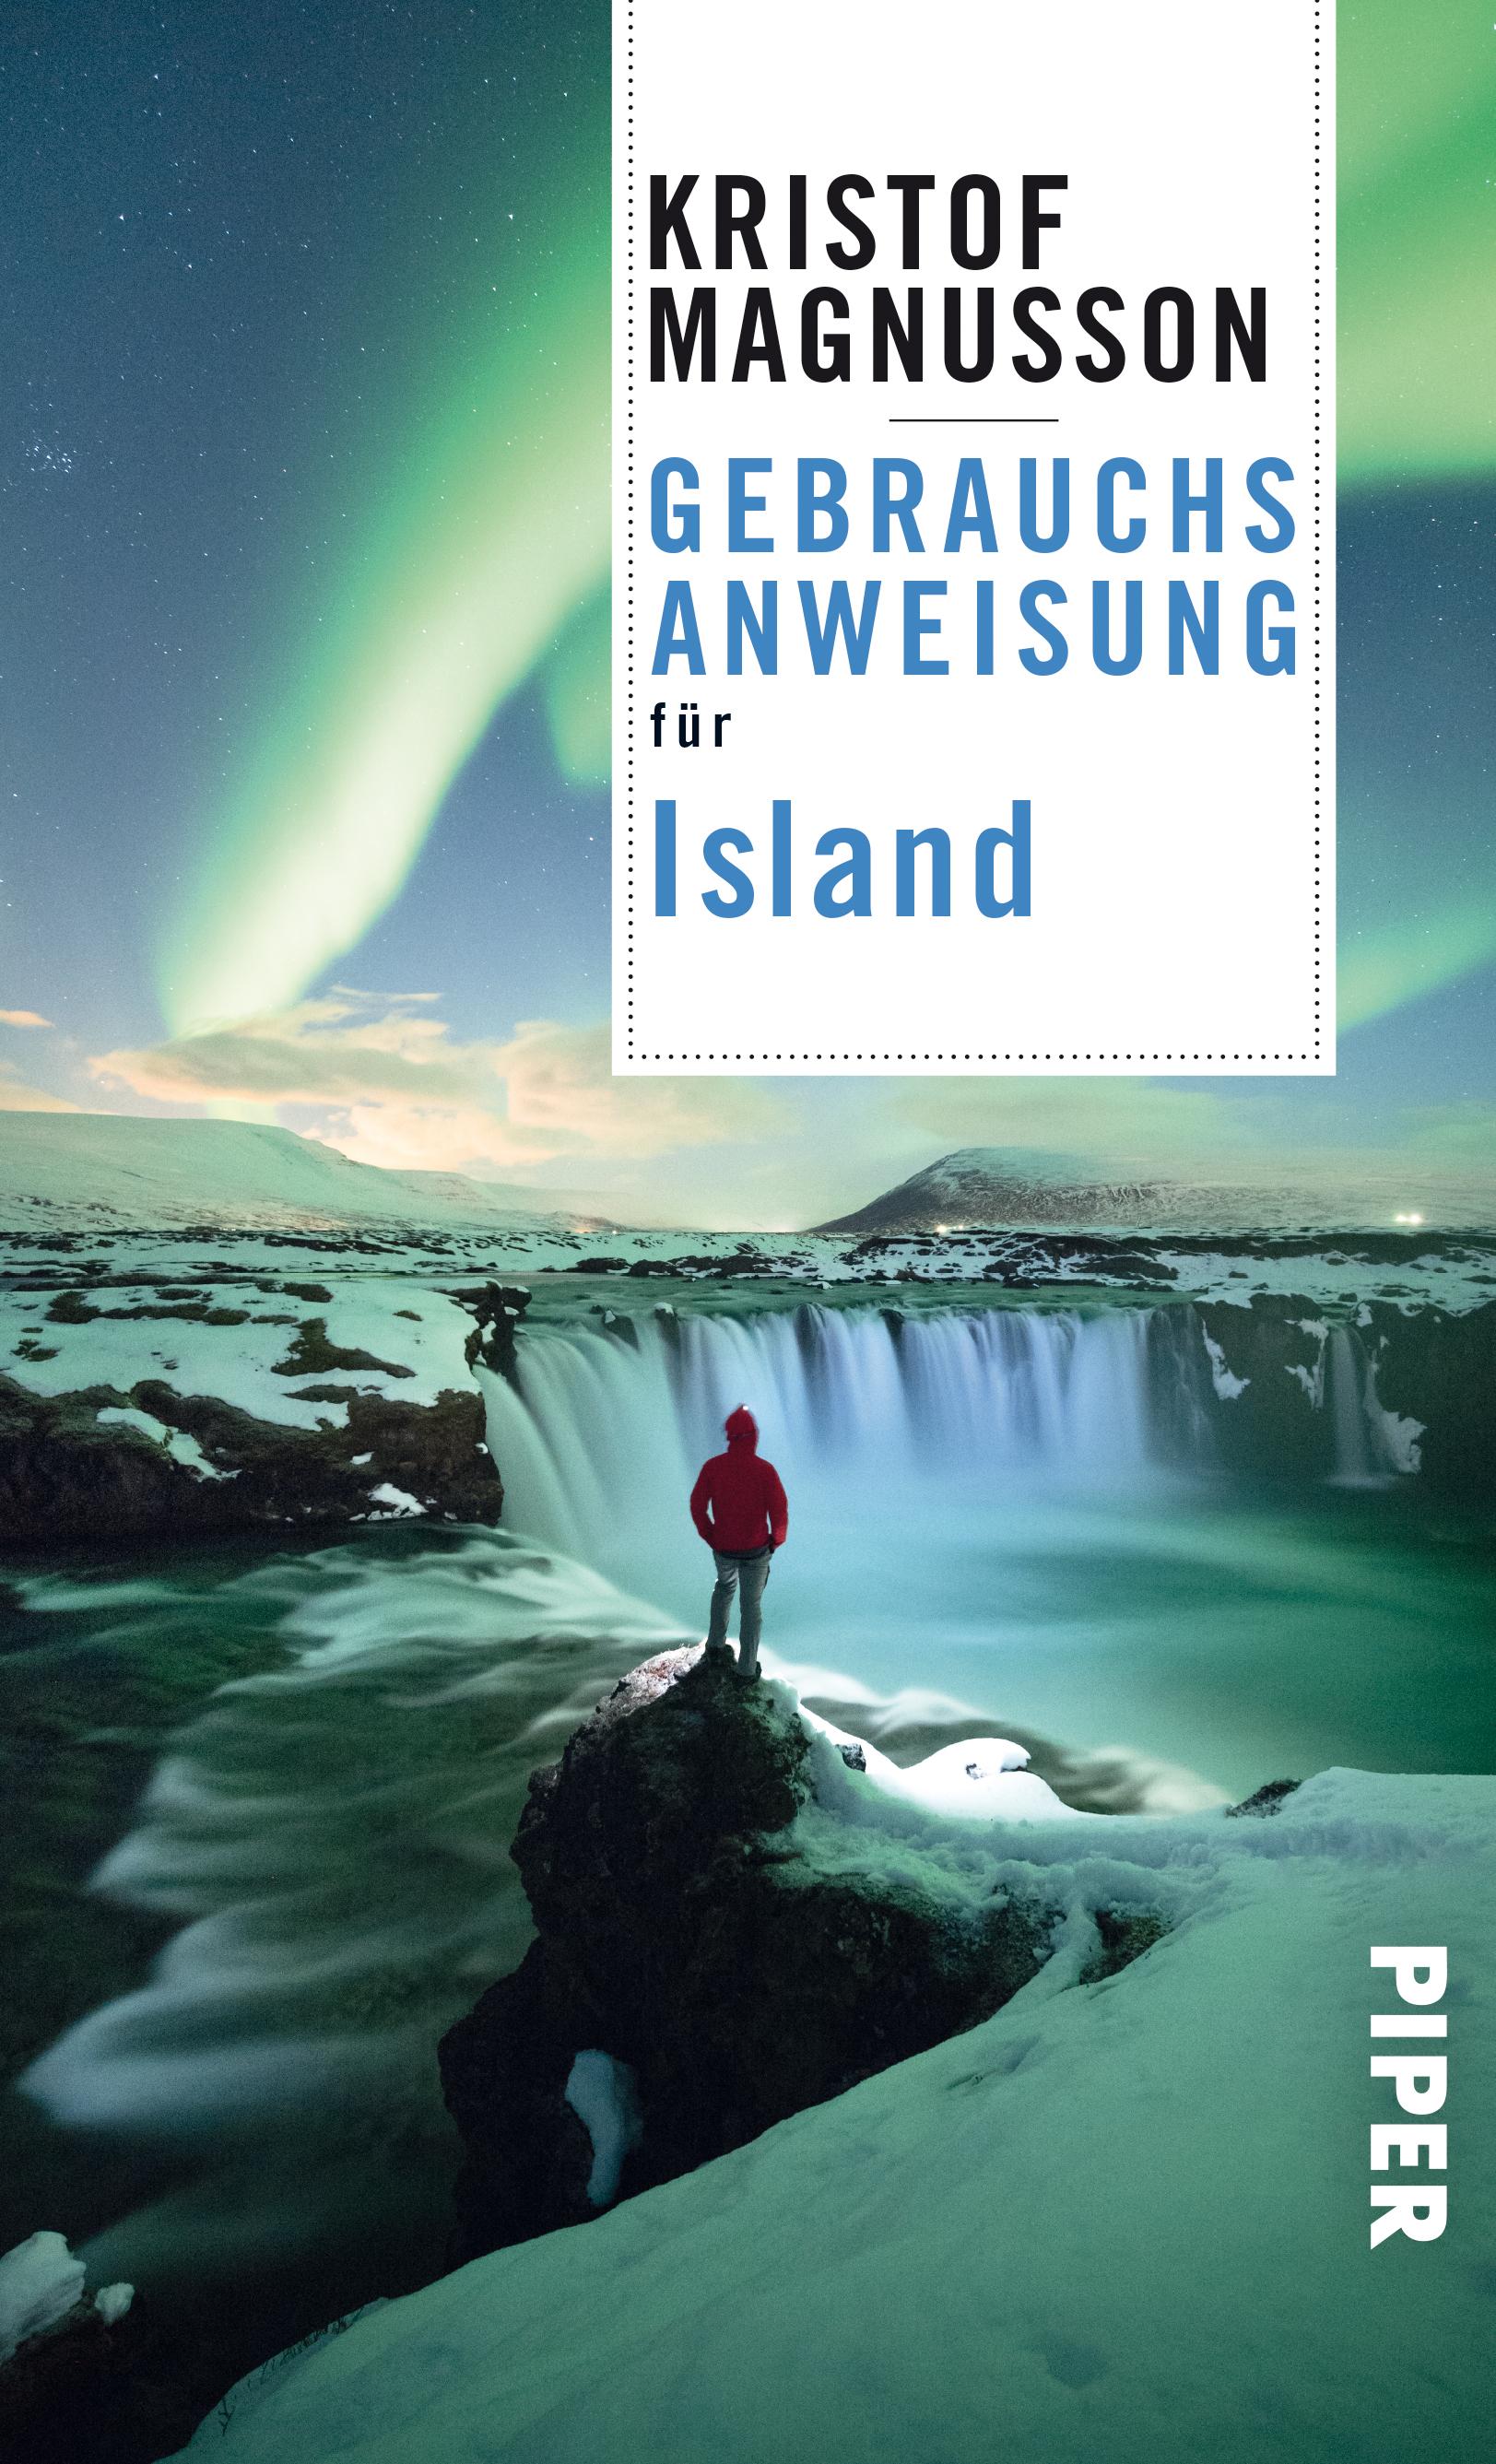 Island Gebrauchsanweisung cover